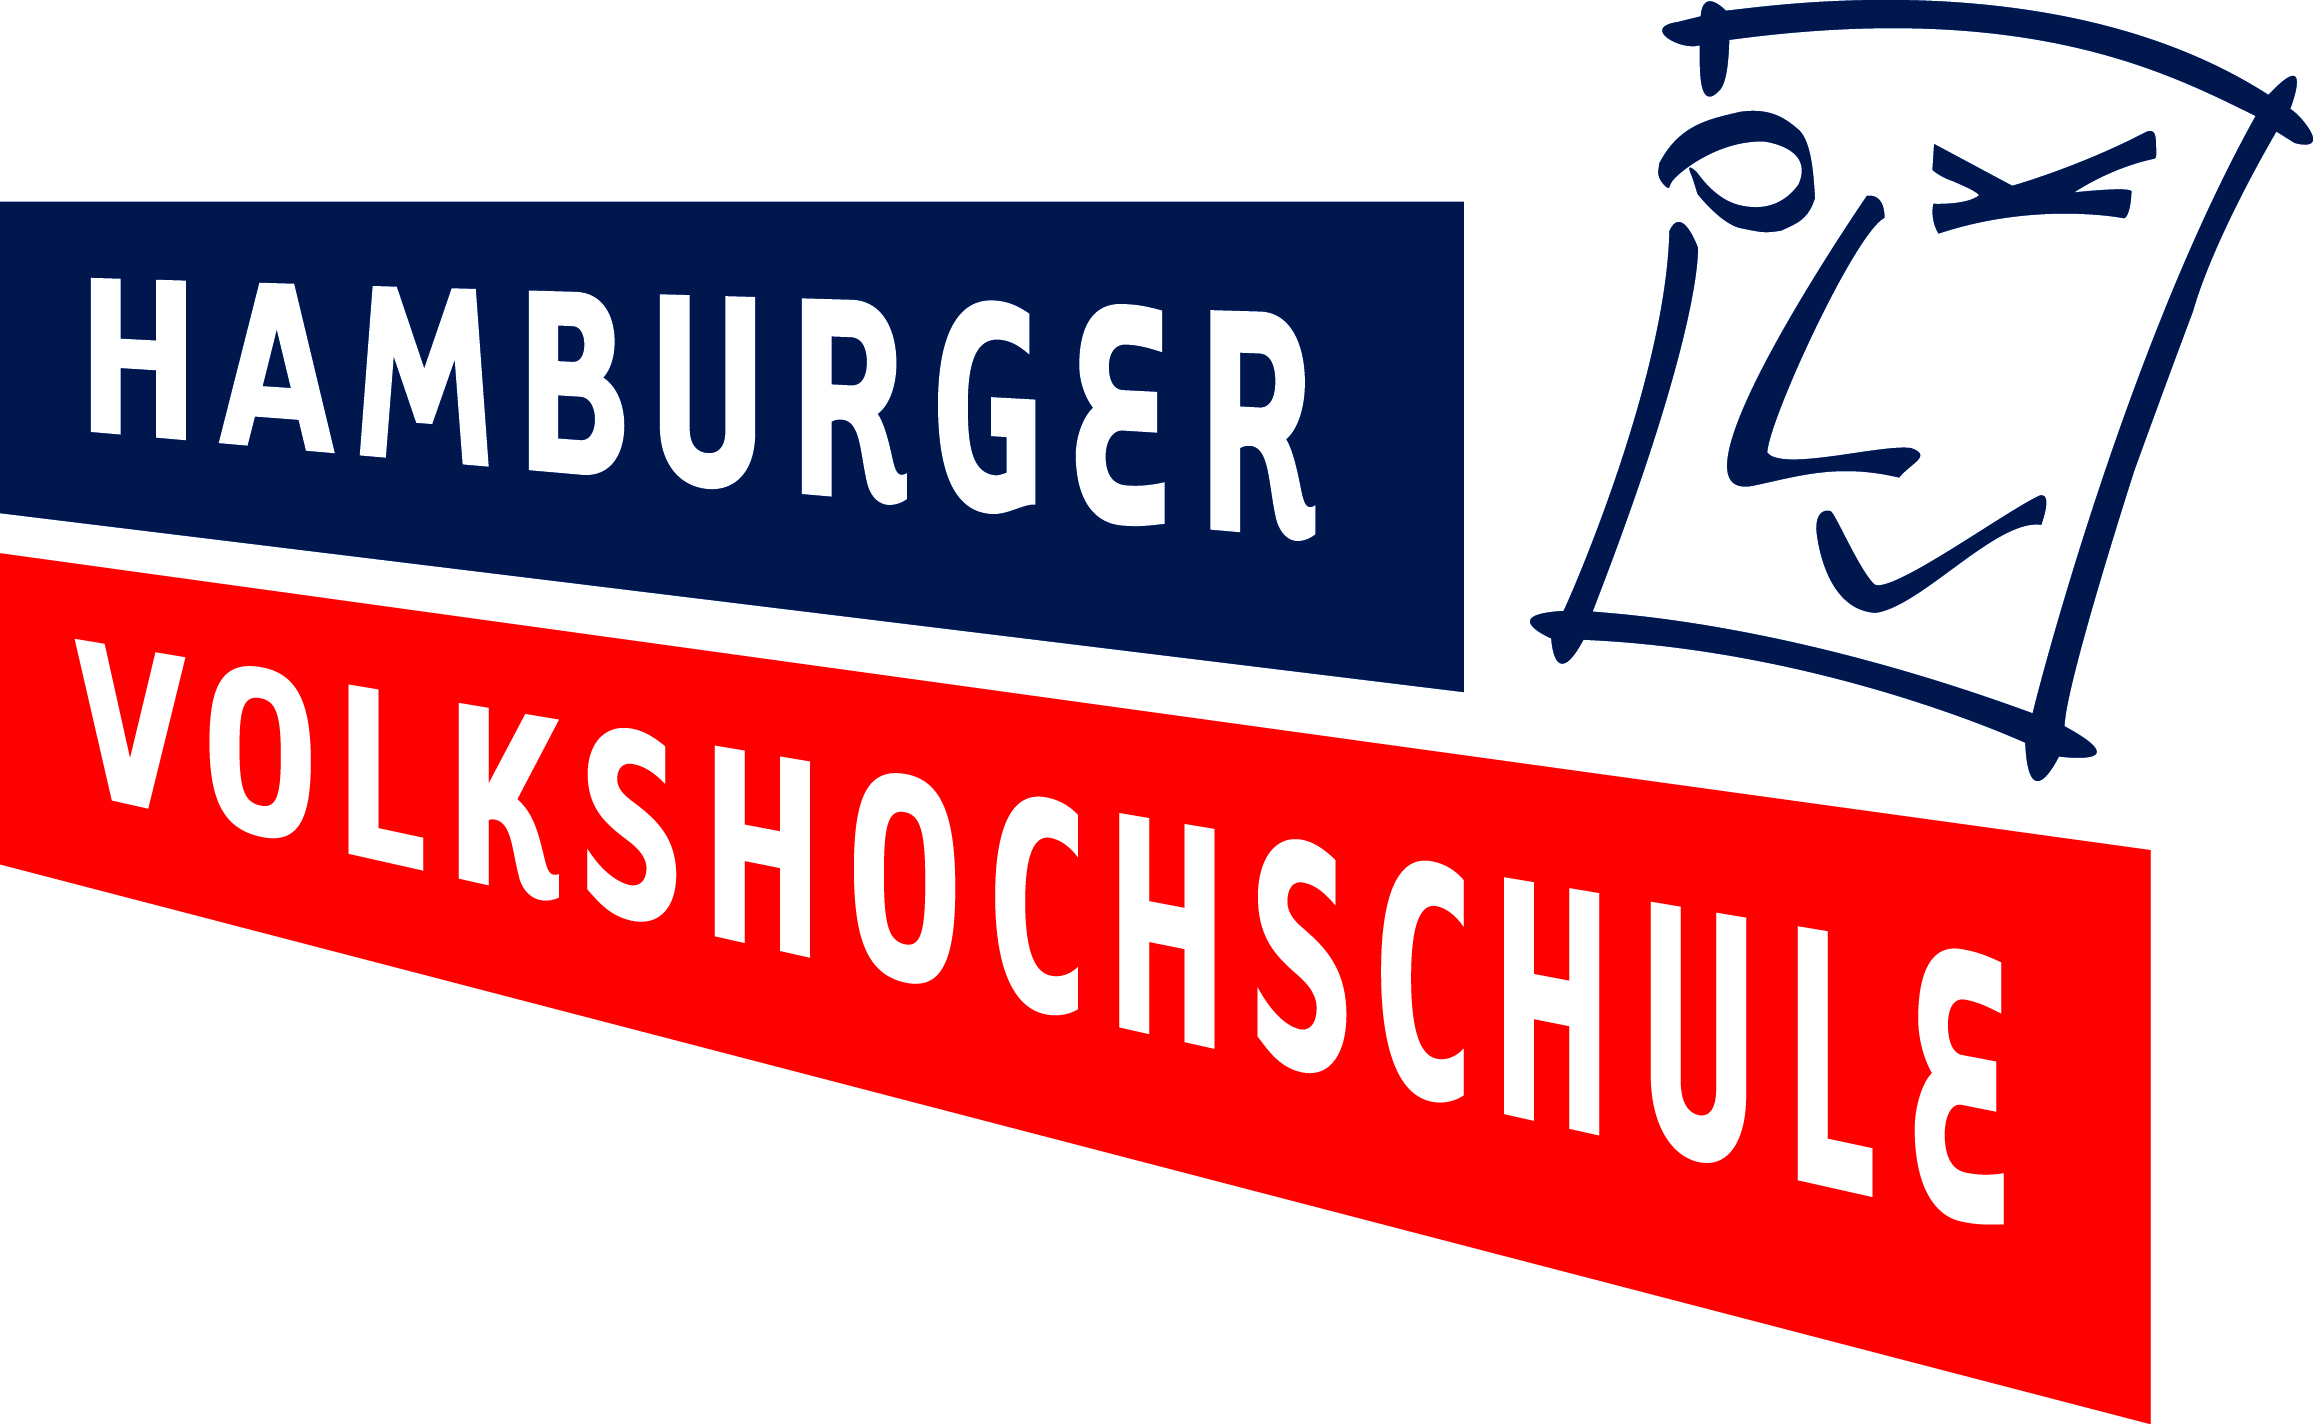 Hamburger Volkshochschule - Hamburger Volkshochschule